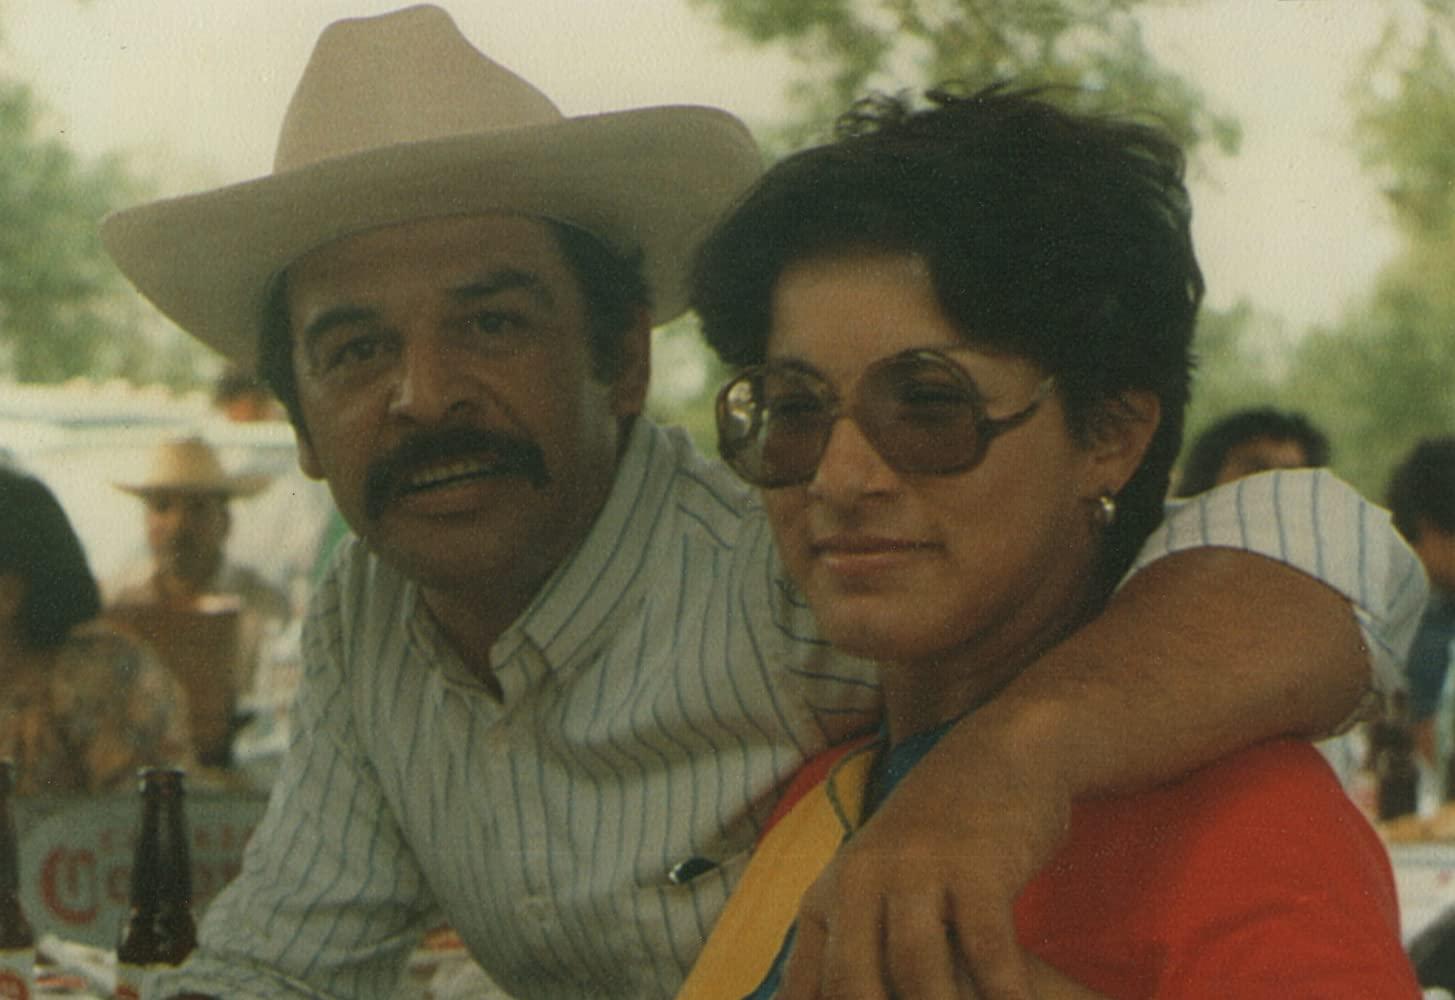 Amazon's 'The Last Narc' Docuseries Investigates the Death of U.S. DEA Agent Kiki Camarena